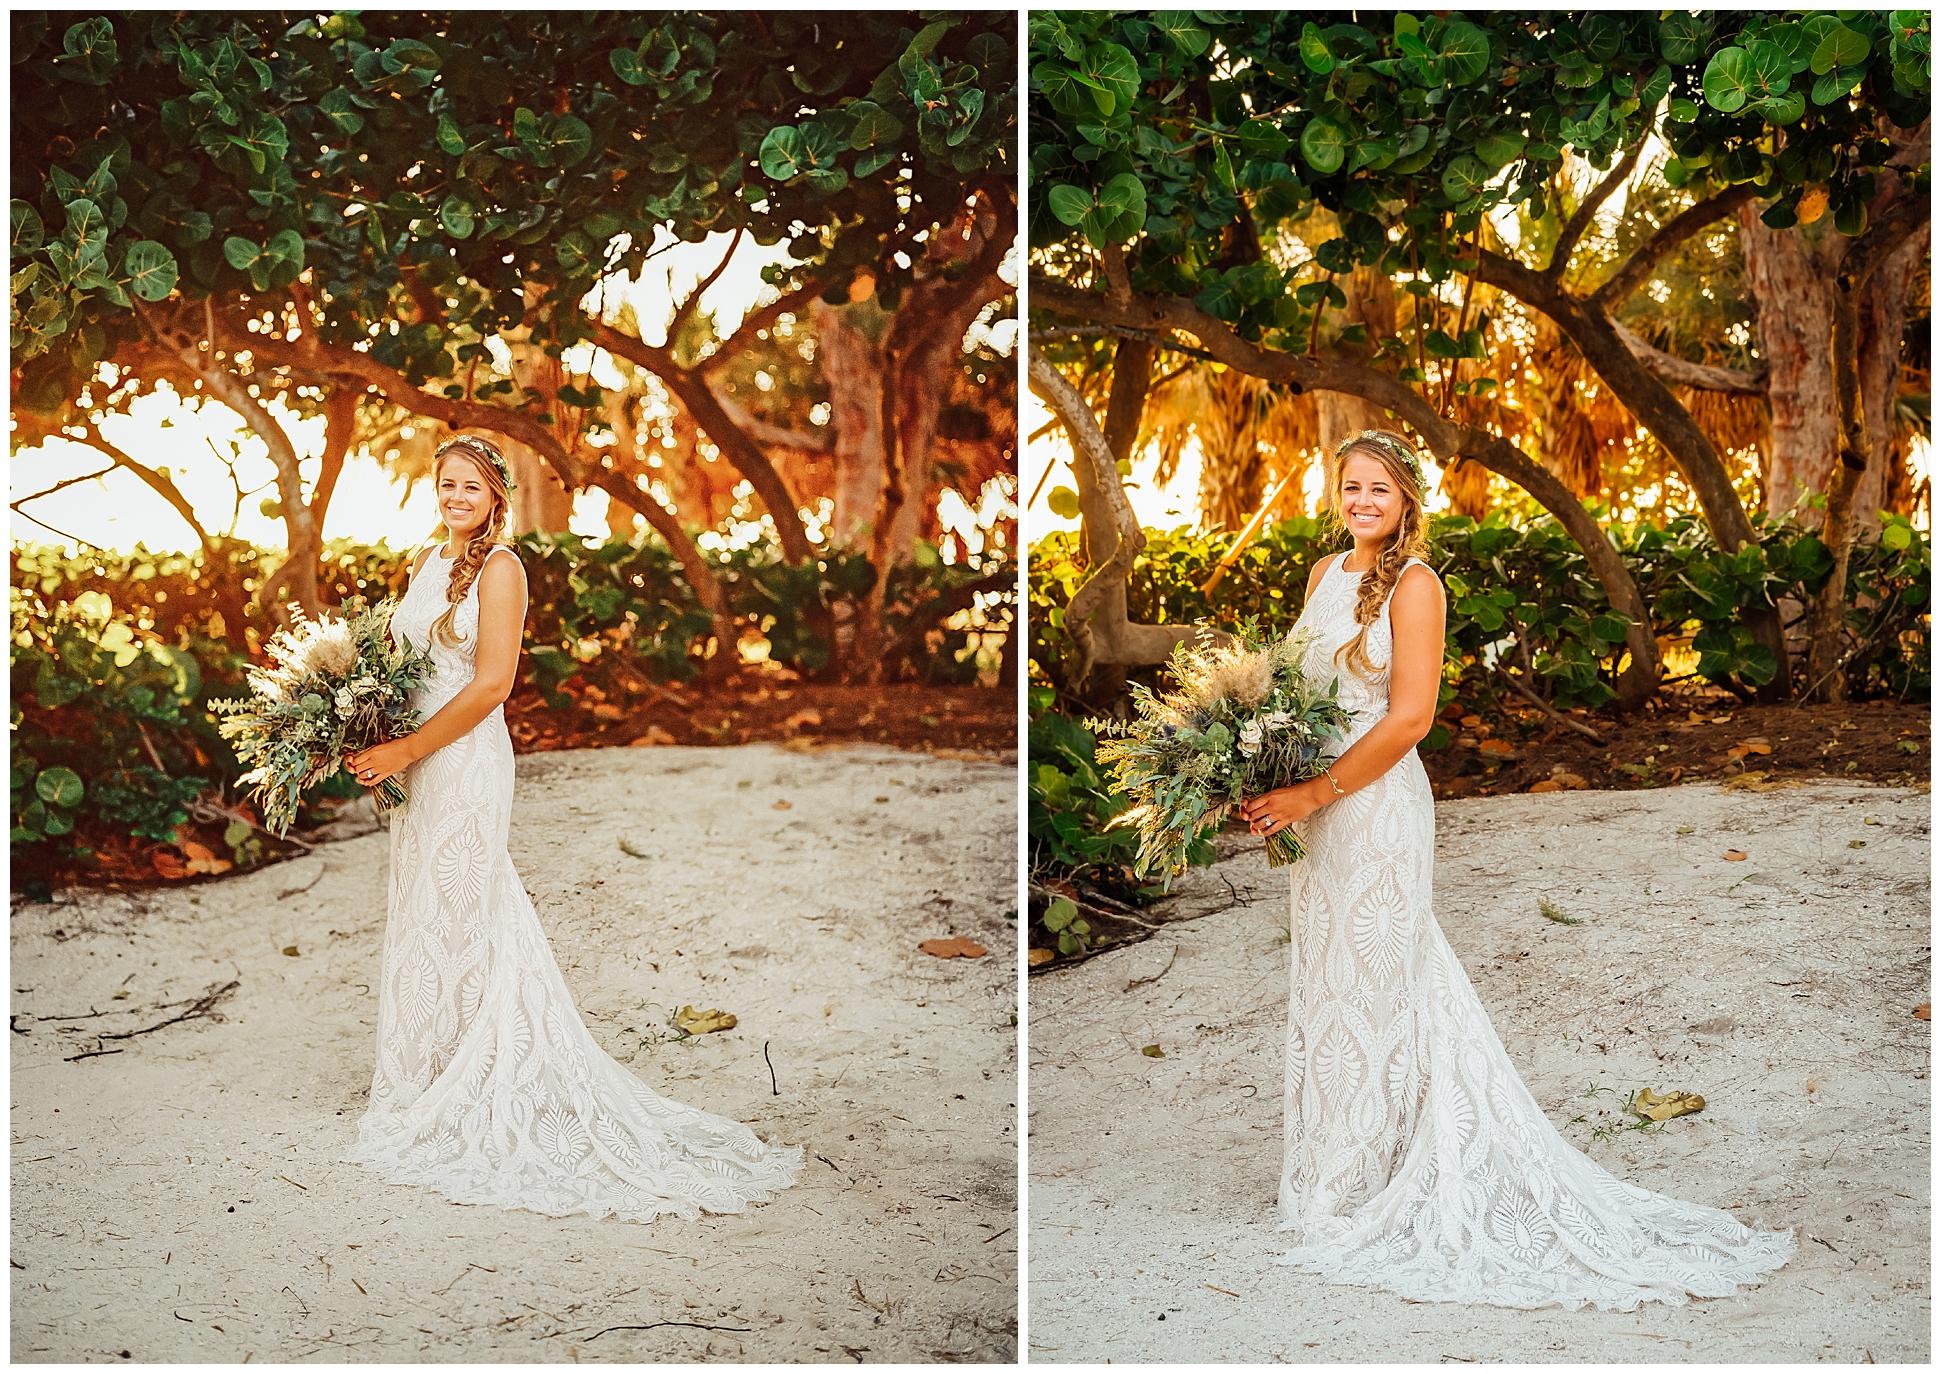 medium-format-film-vs-digital-wedding-photography-florida-beach_0019.jpg